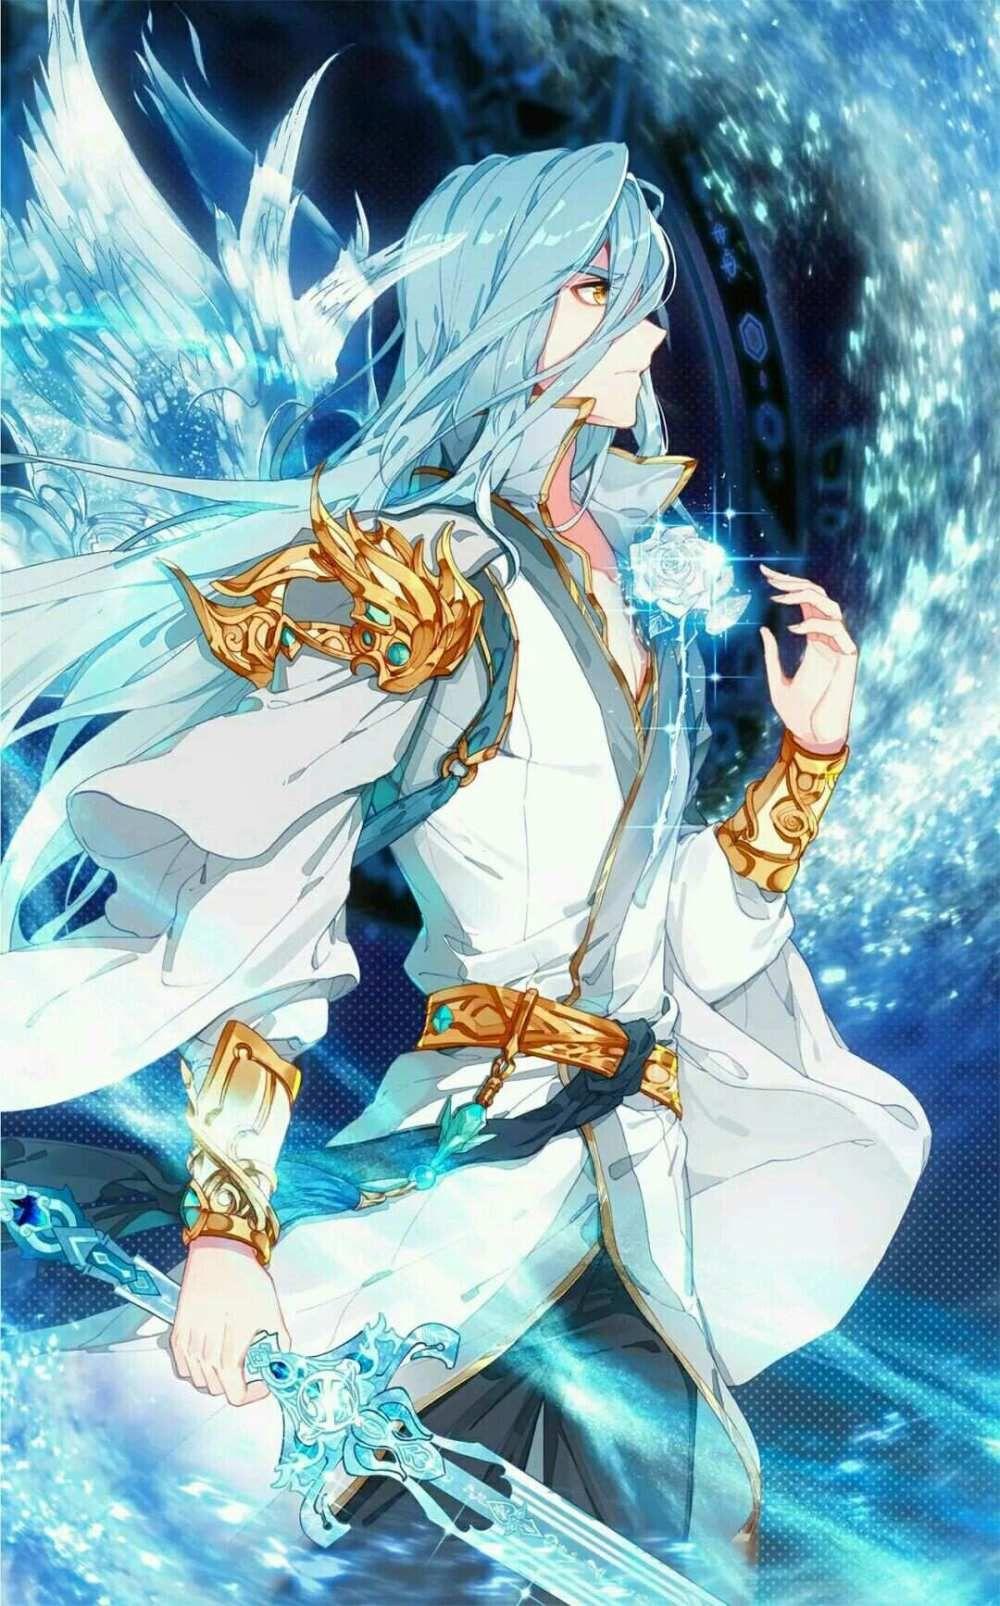 Soul Land 3 Wu Zhangkong Blue Anime Blue Hair Anime Boy Handsome Anime